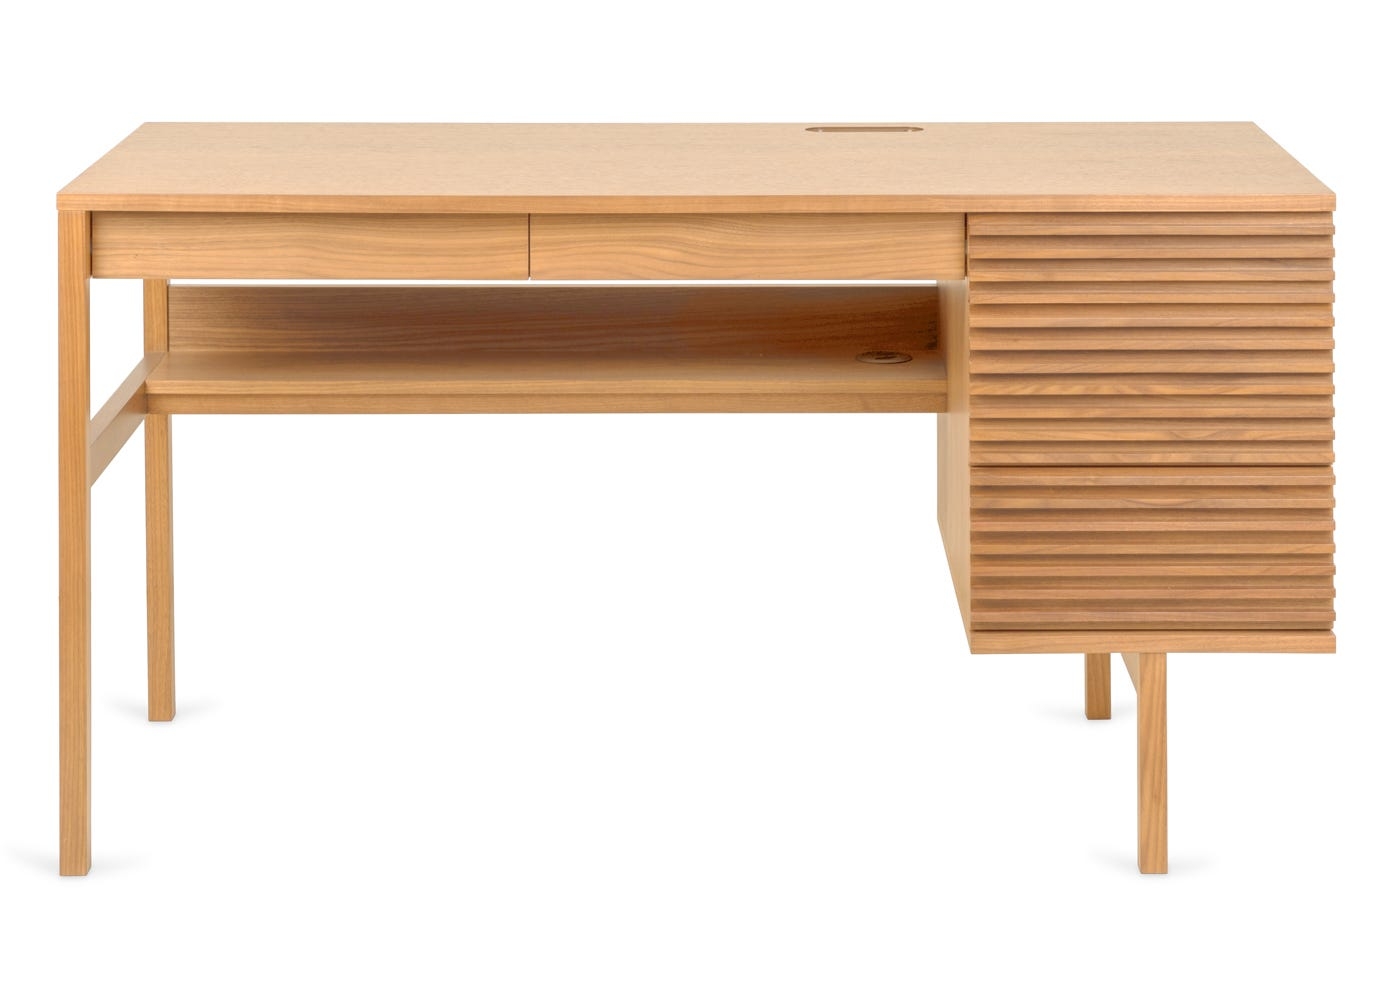 Verona desk in oak - Front profile.